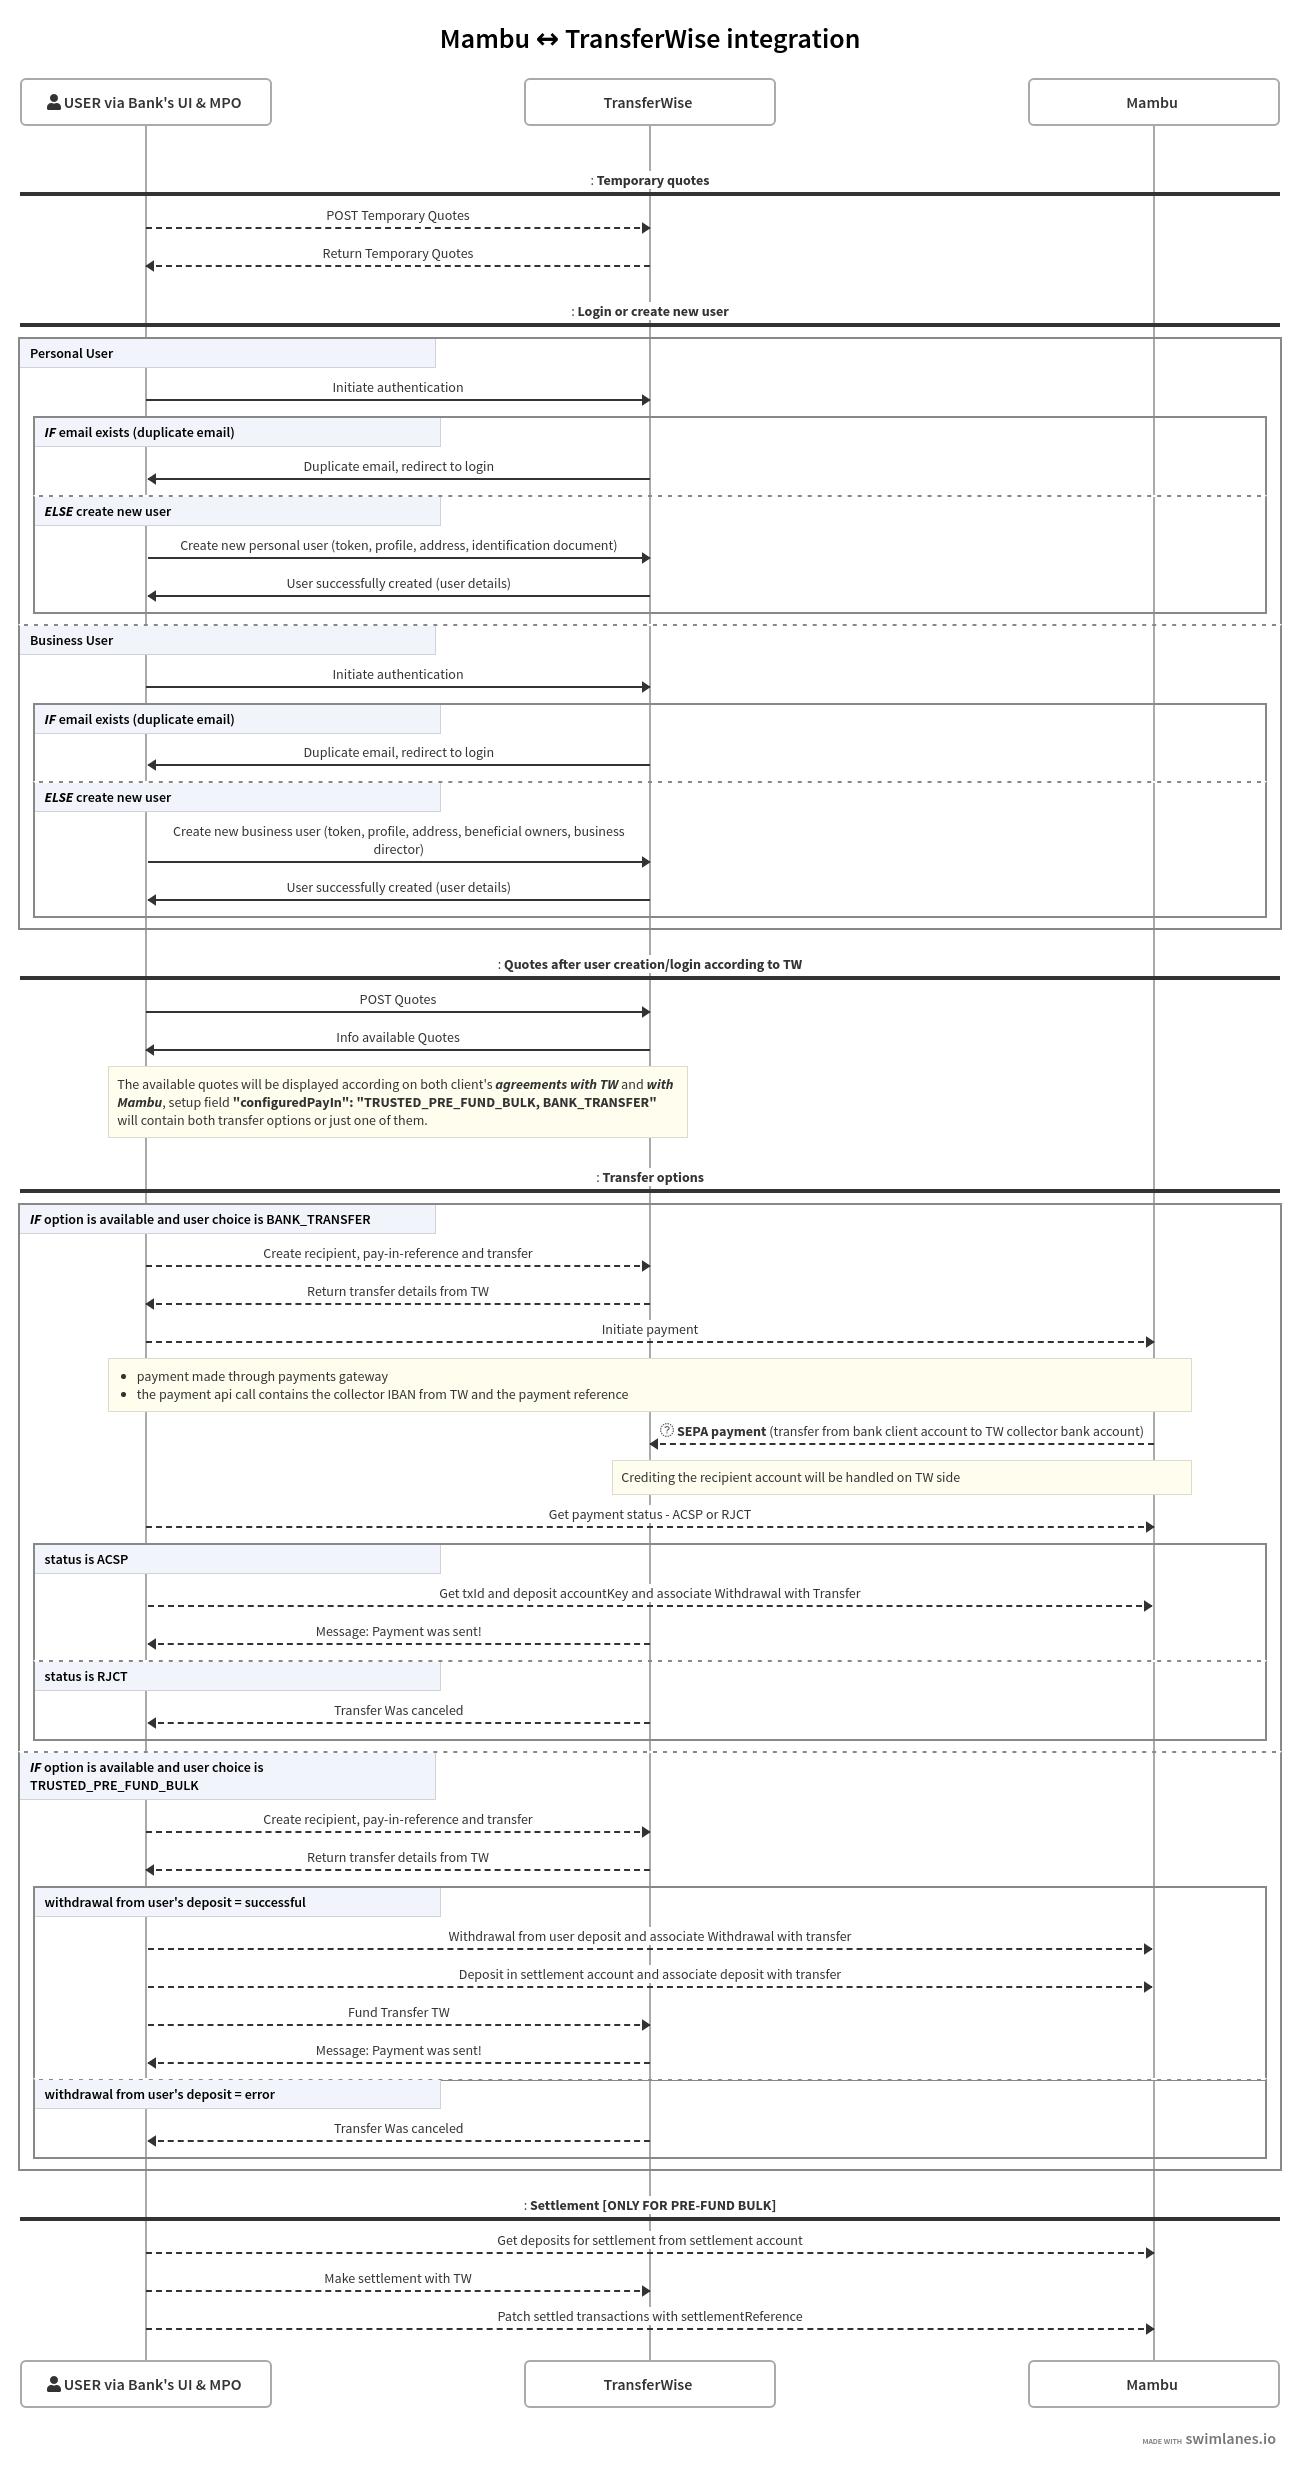 Mambu - TransferWise integration diagram